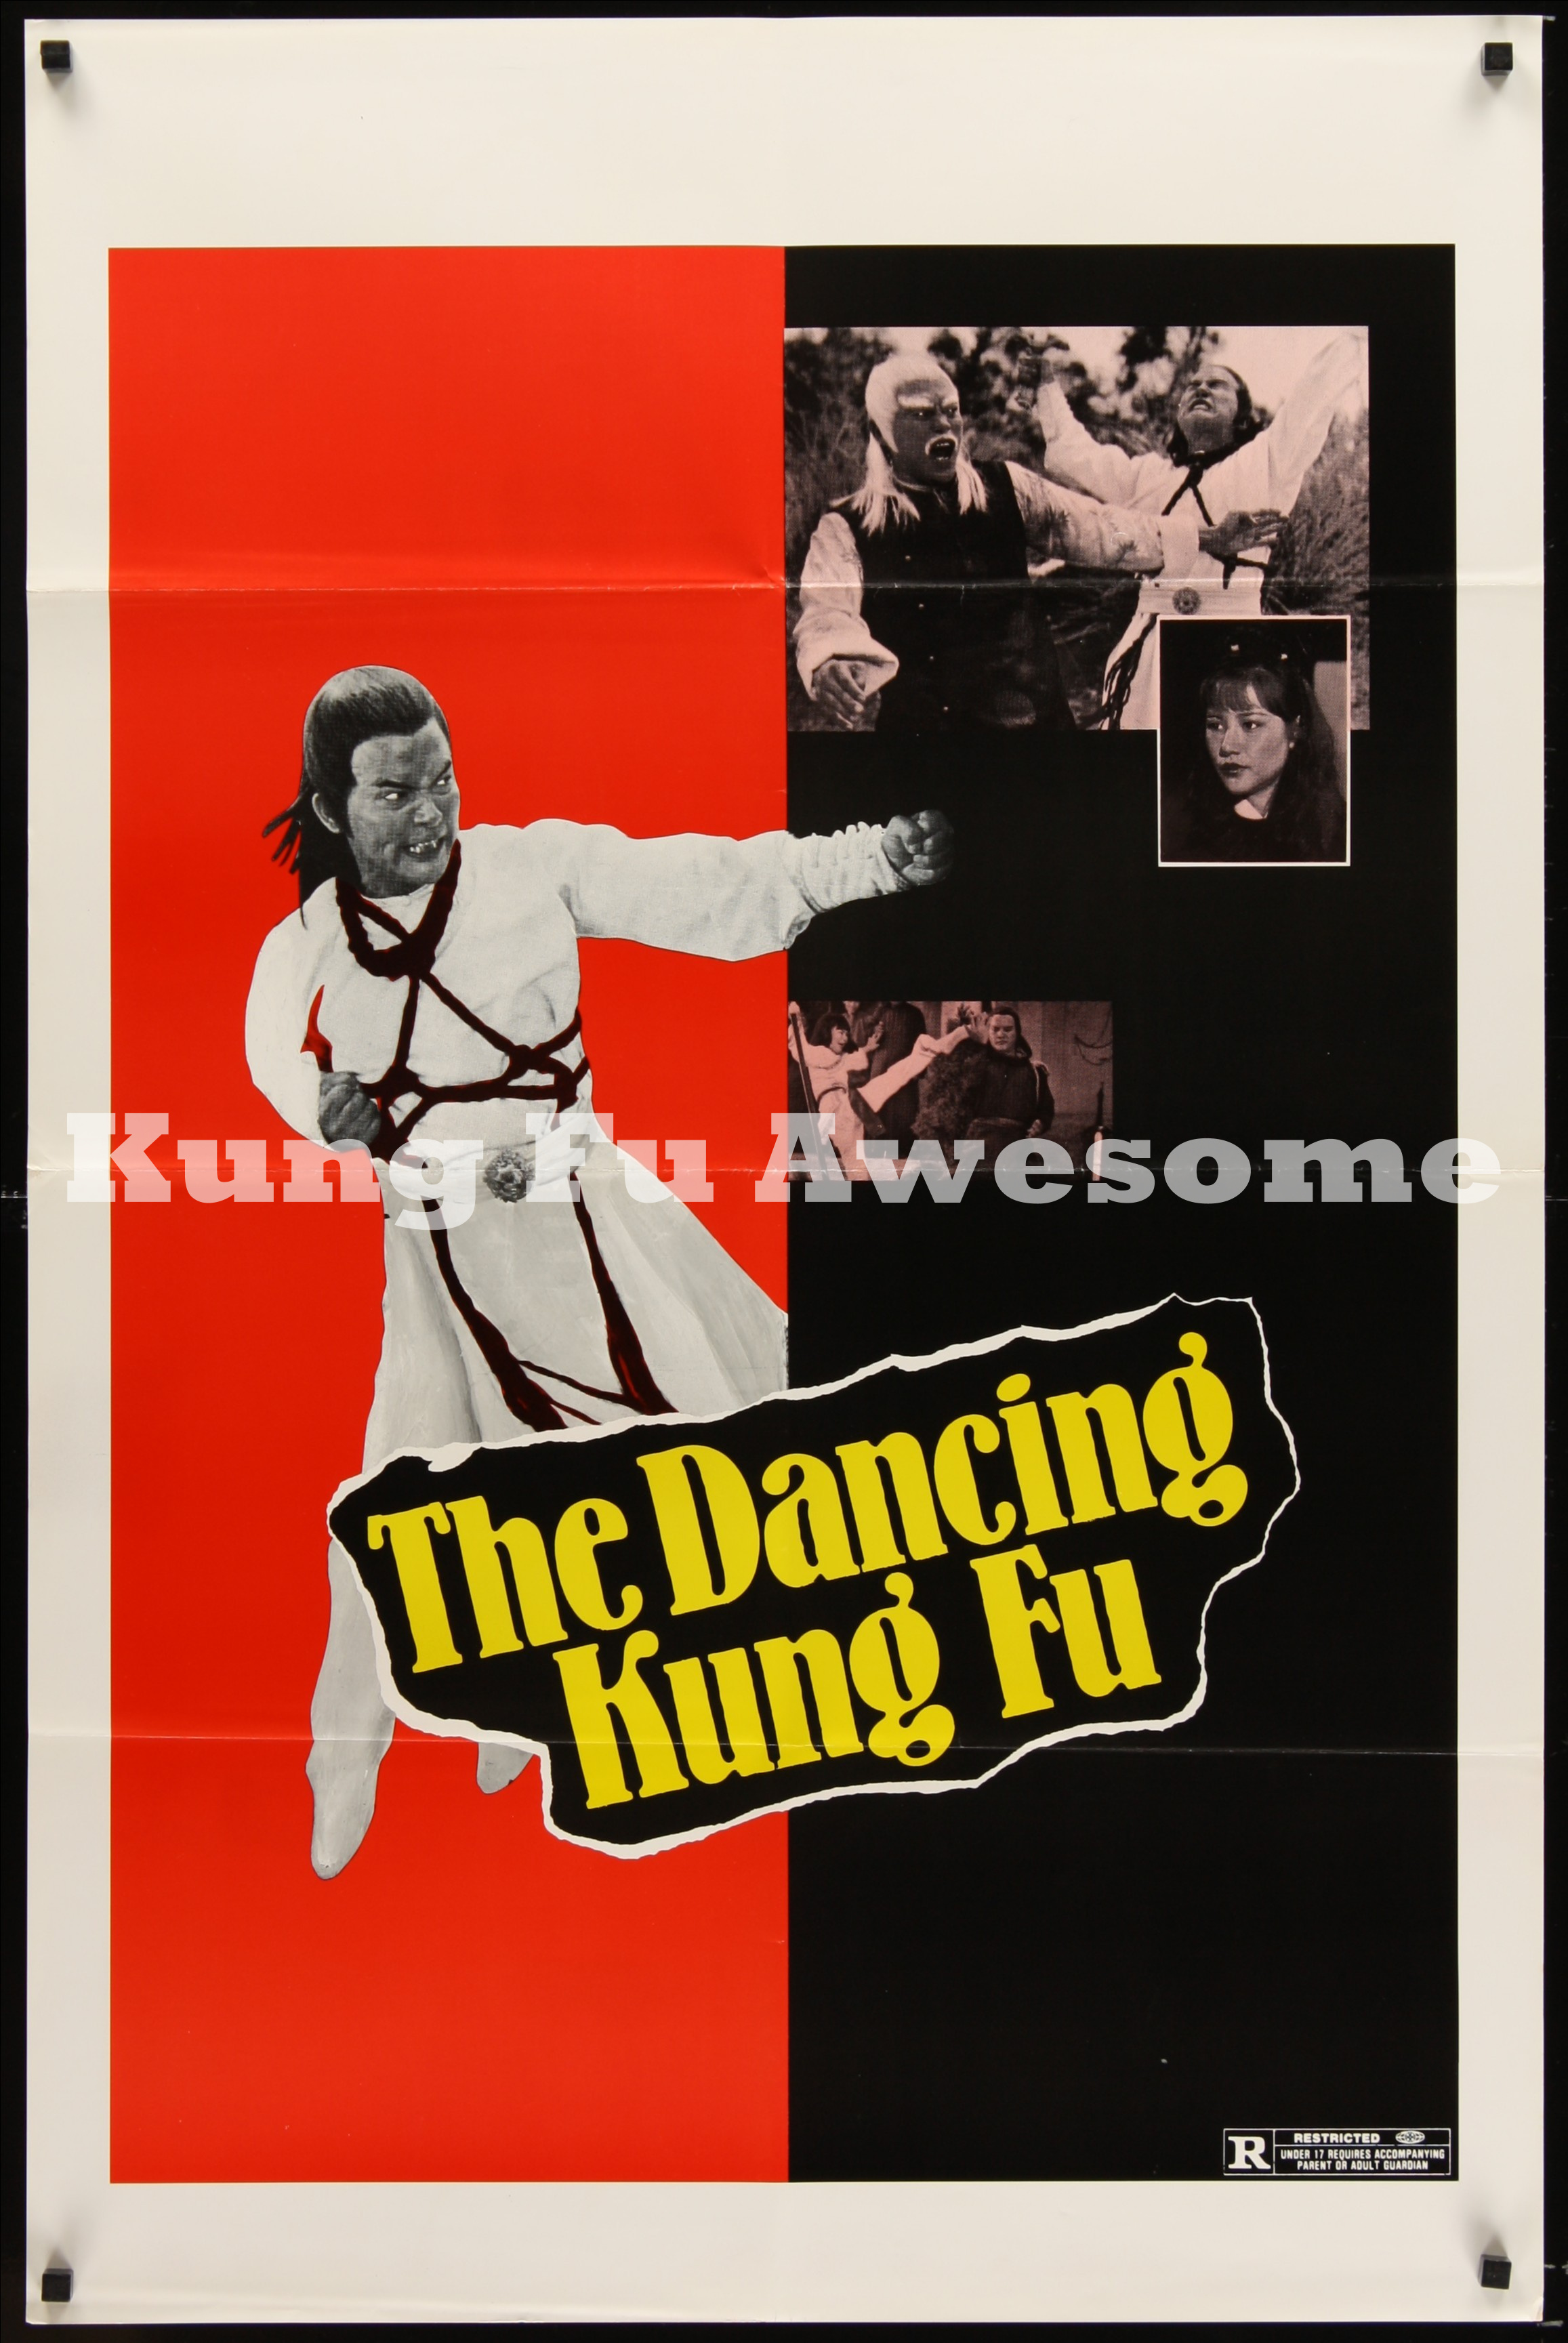 dancing_kung_fu_teaser_NZ03181_L.jpg